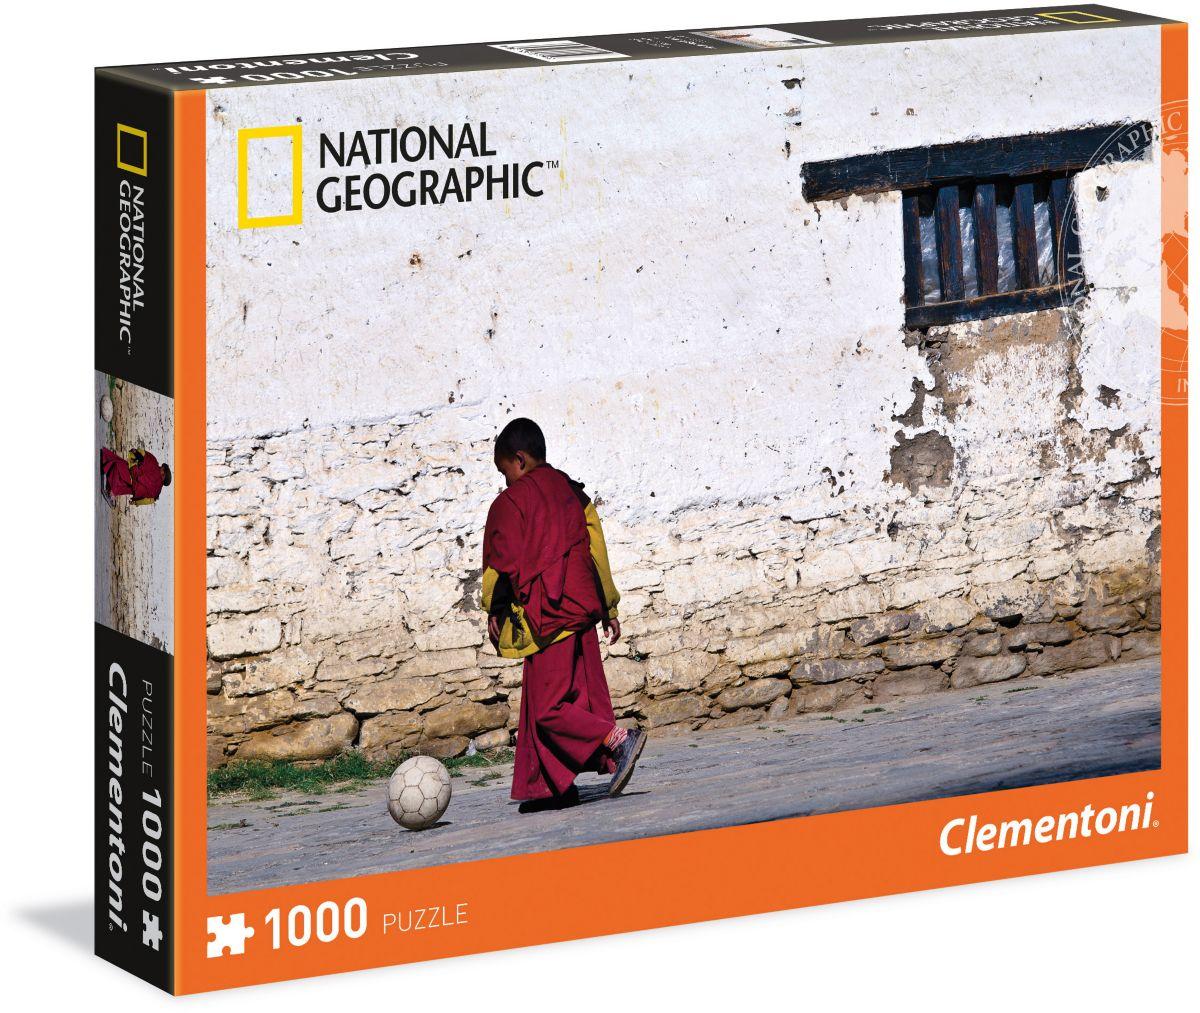 Clementoni Puzzle, 1000 Teile, »National Geogra...